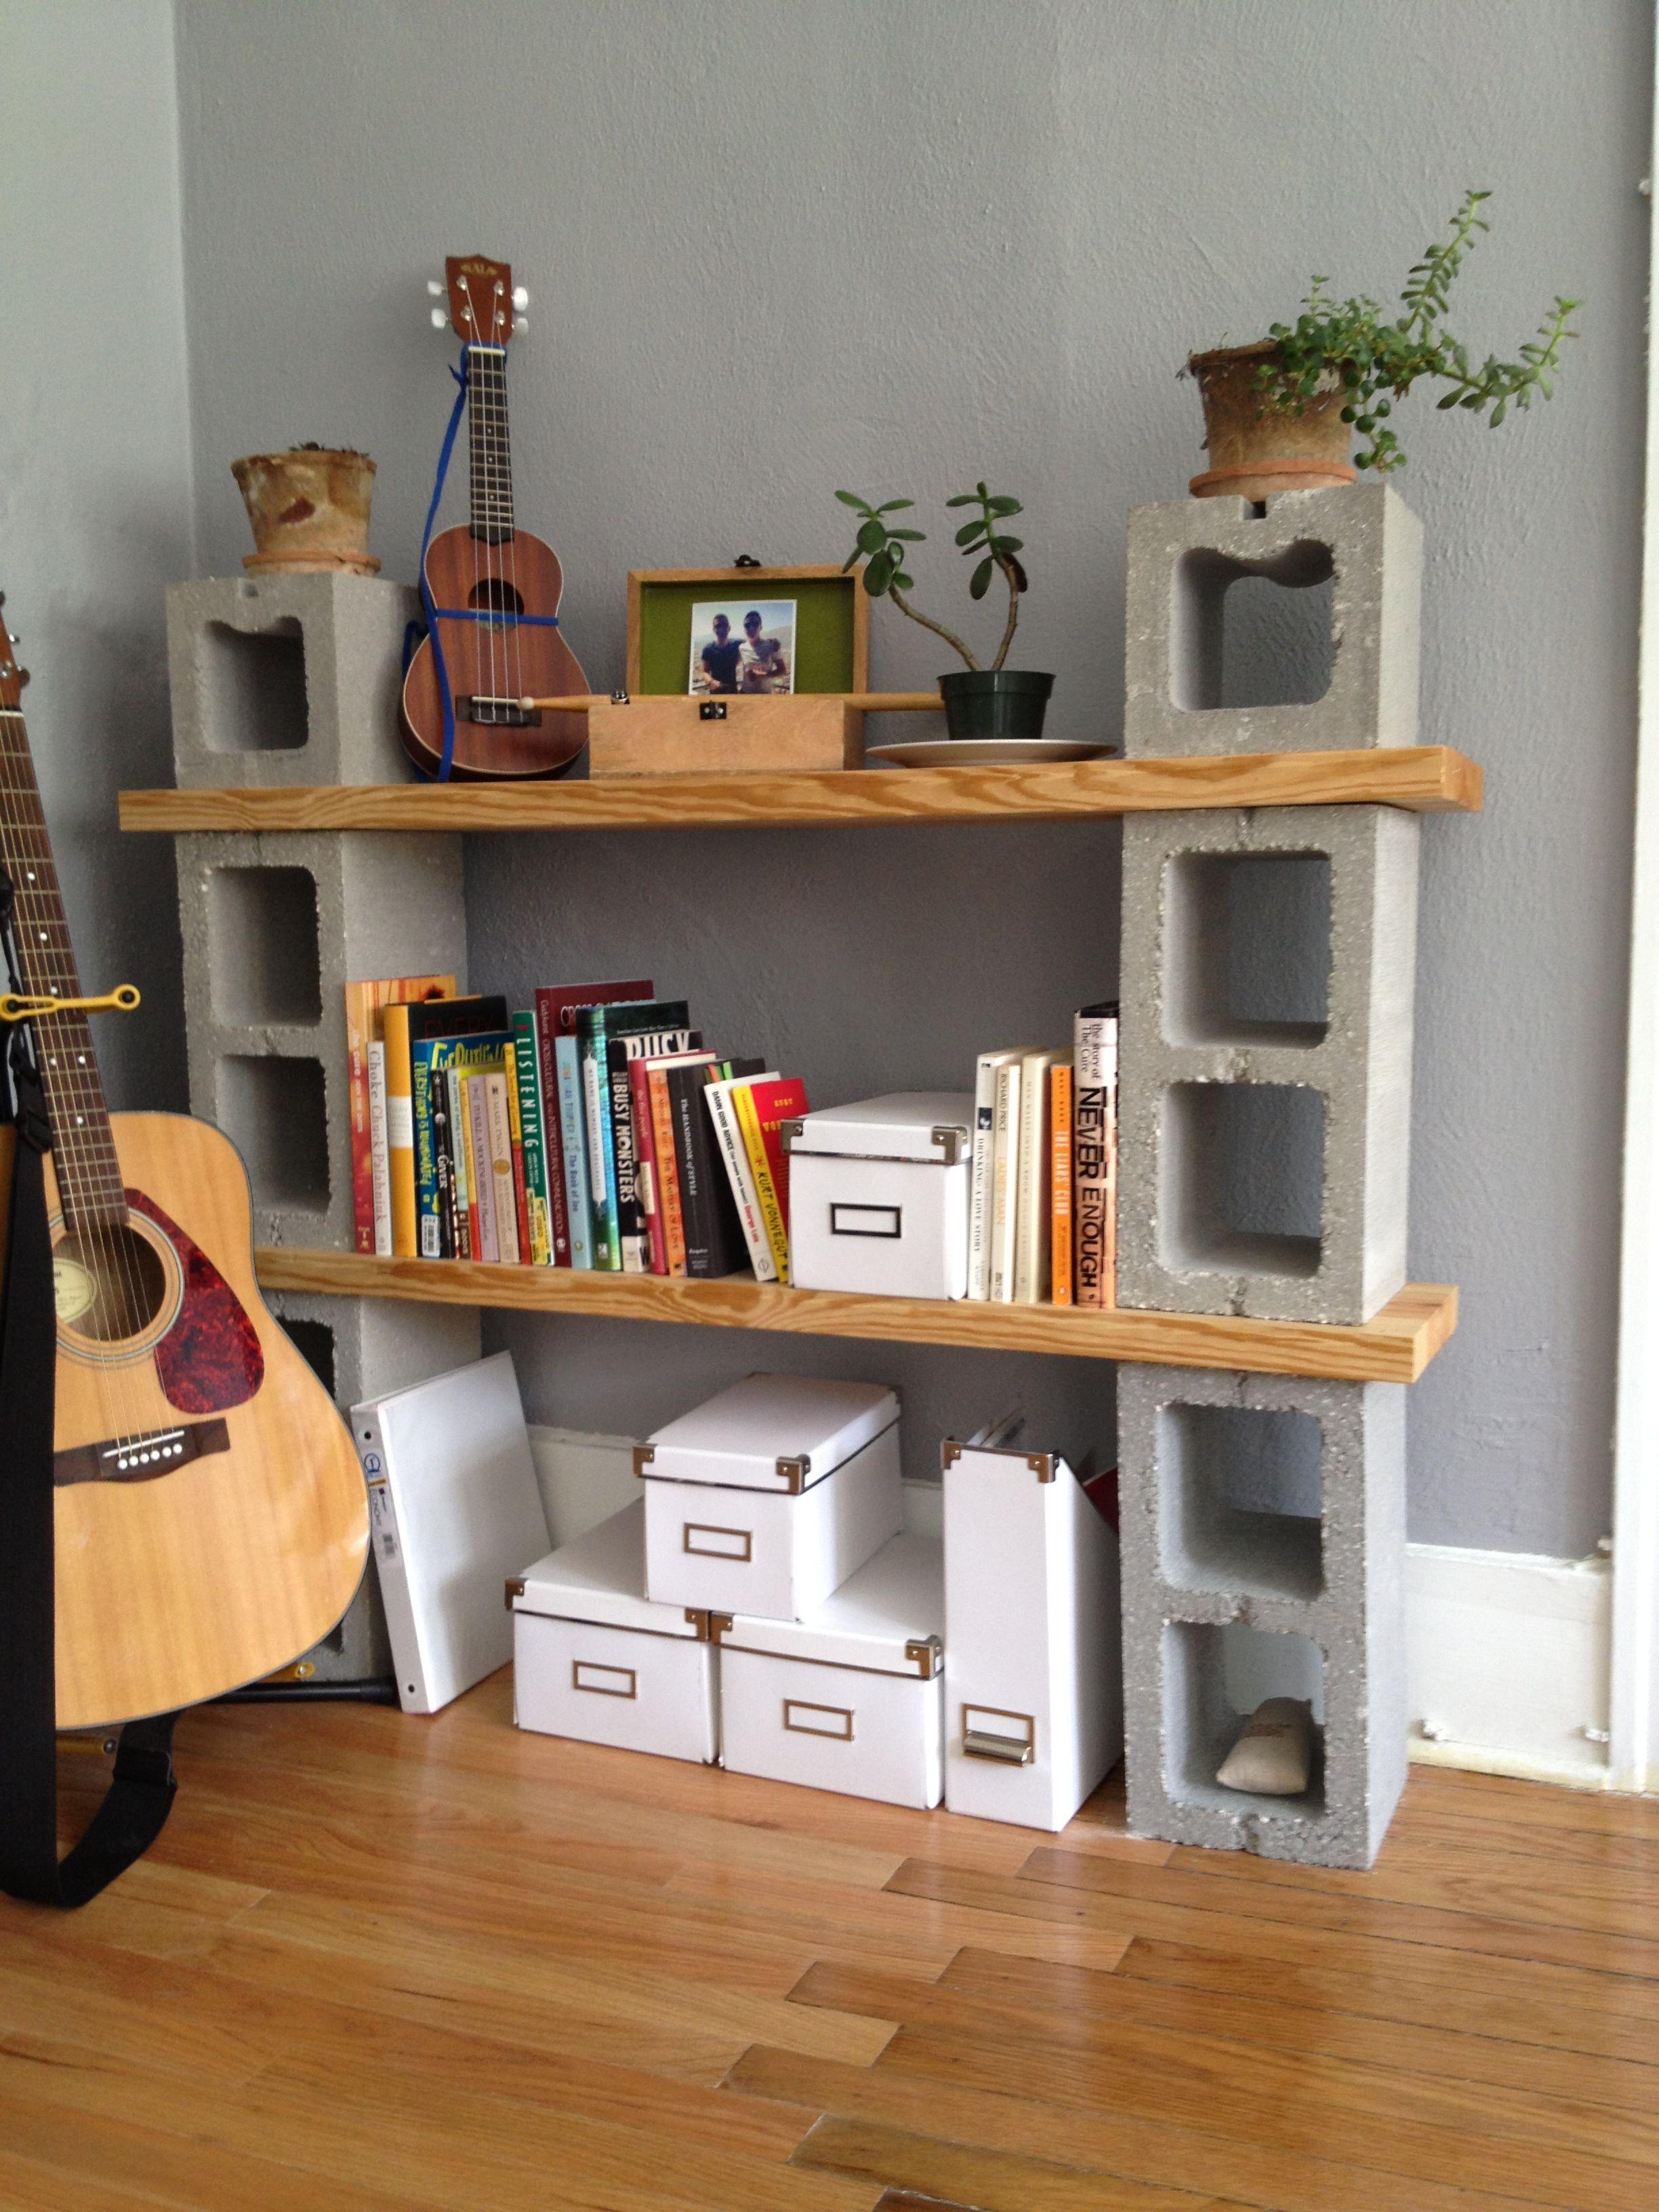 20 Fabulous Diy Ideas For Home Shelving Diy Shelves Cinder